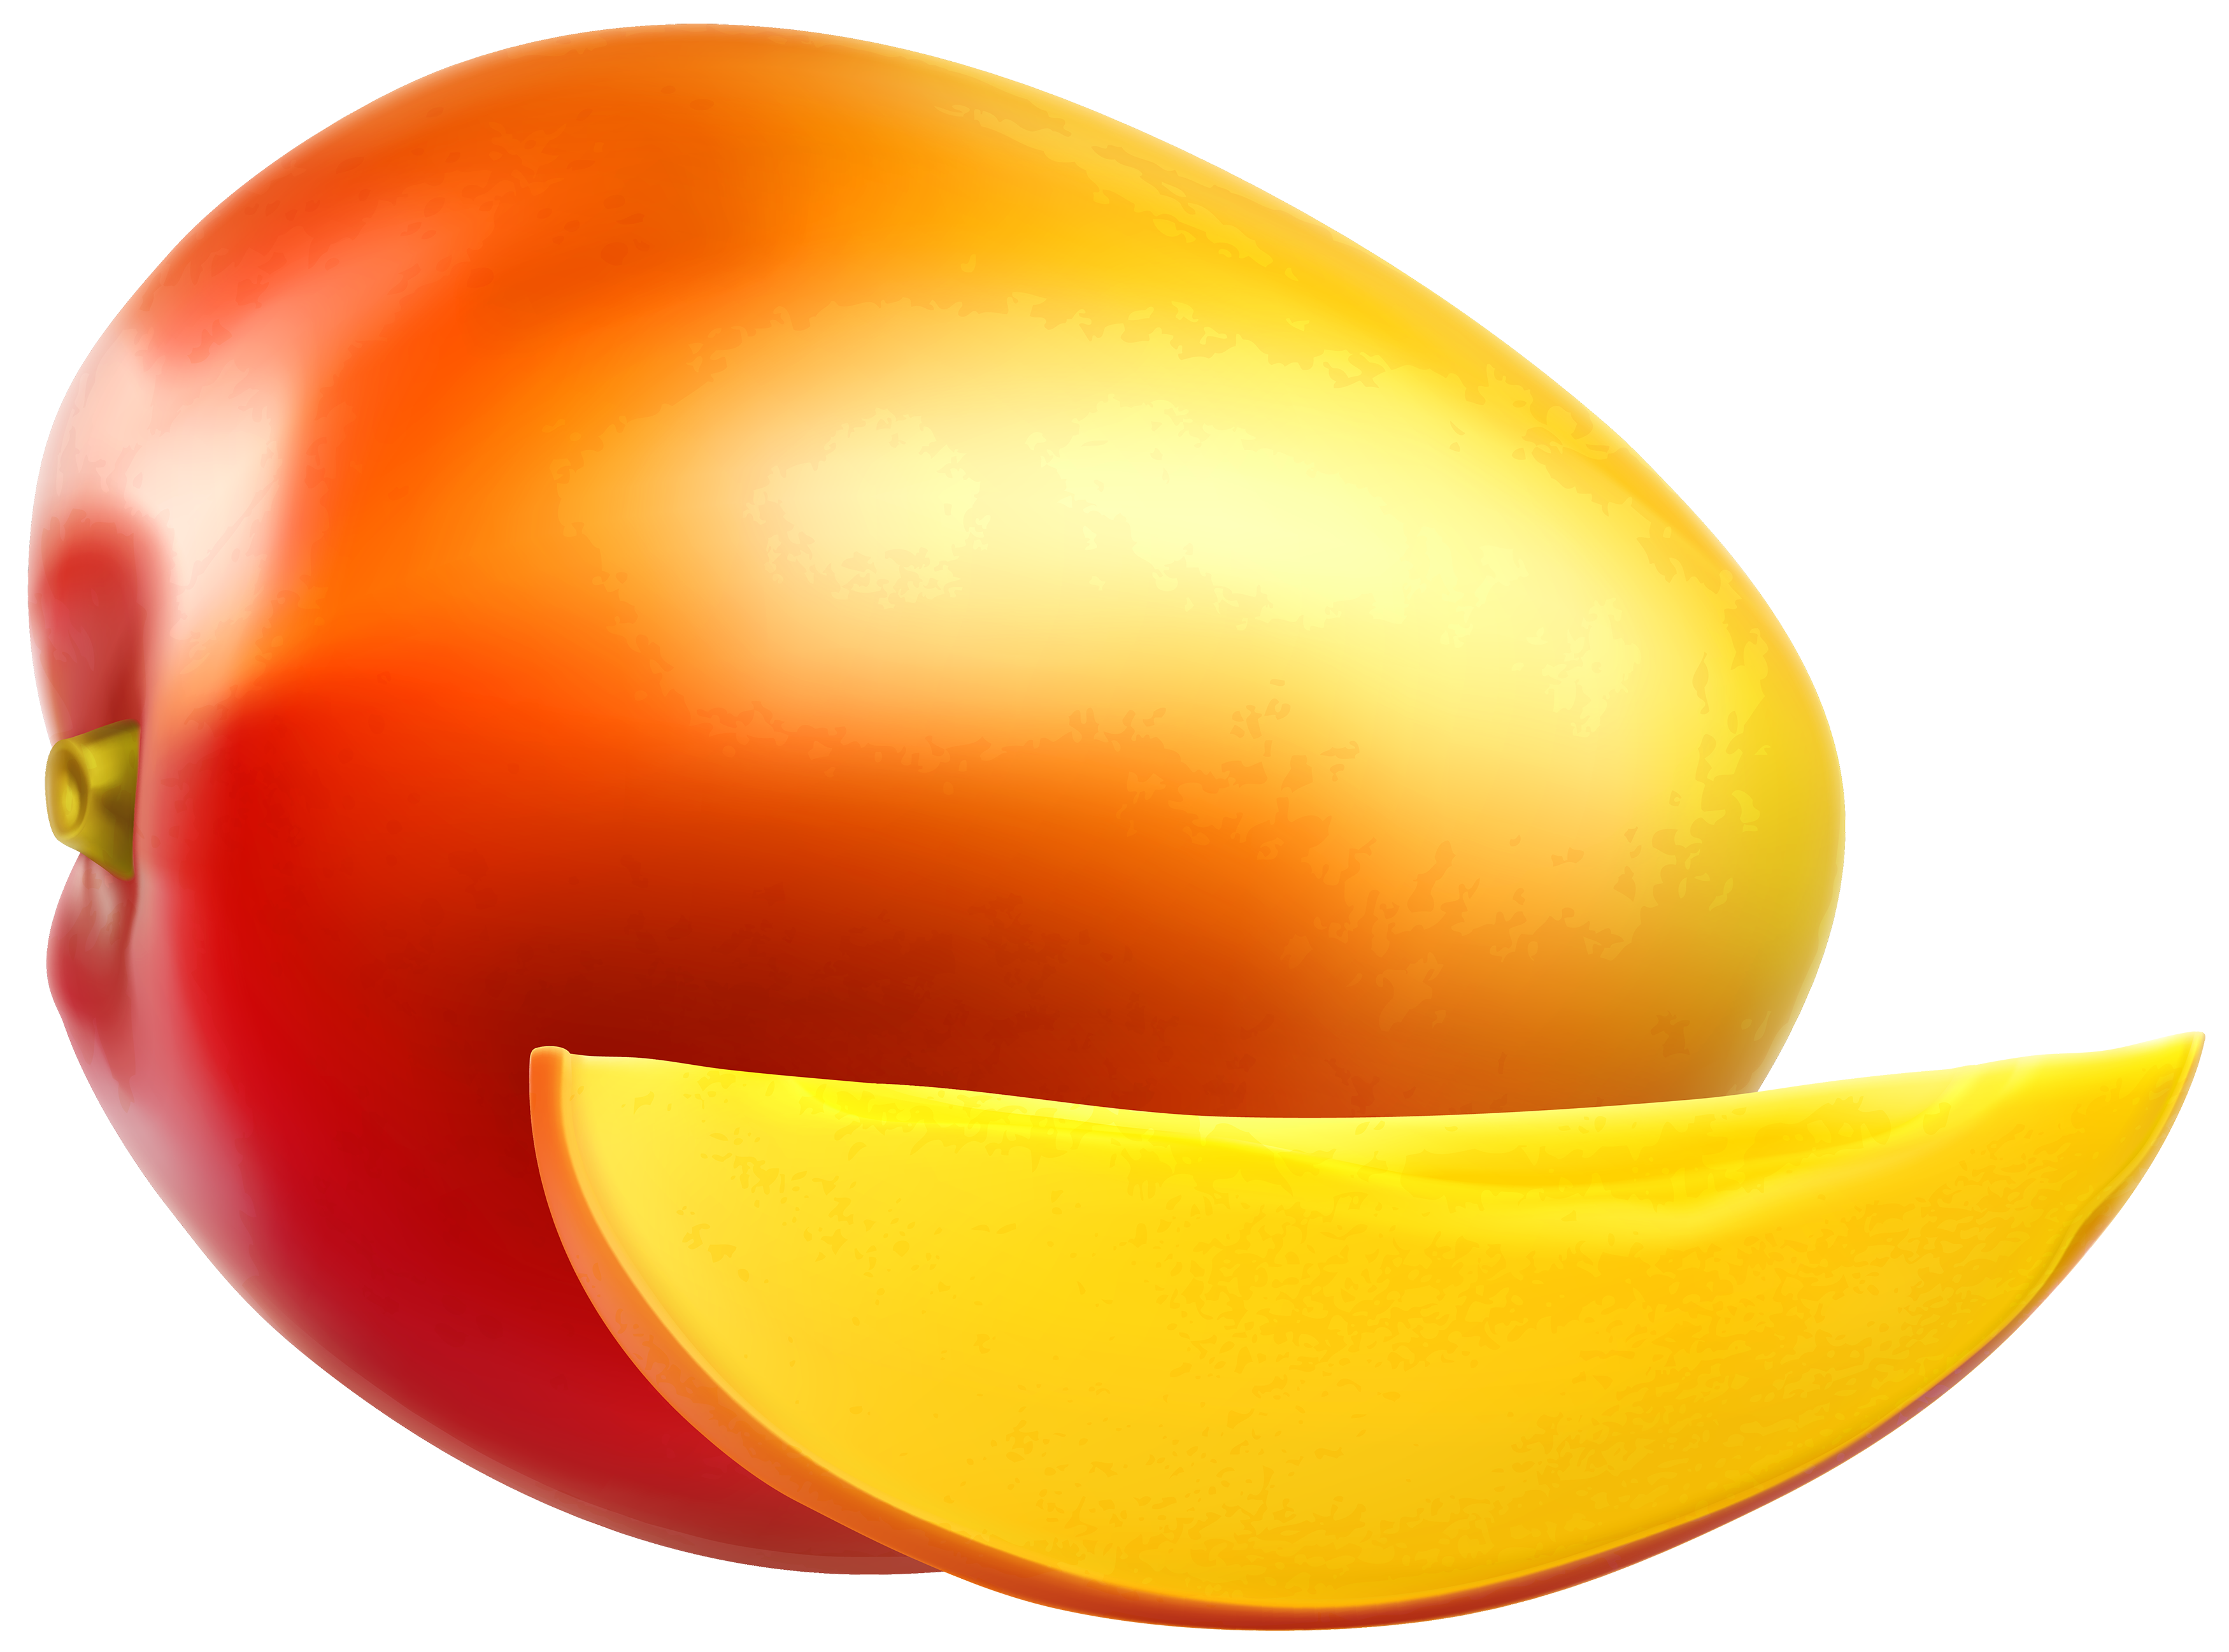 Clipart of mango.